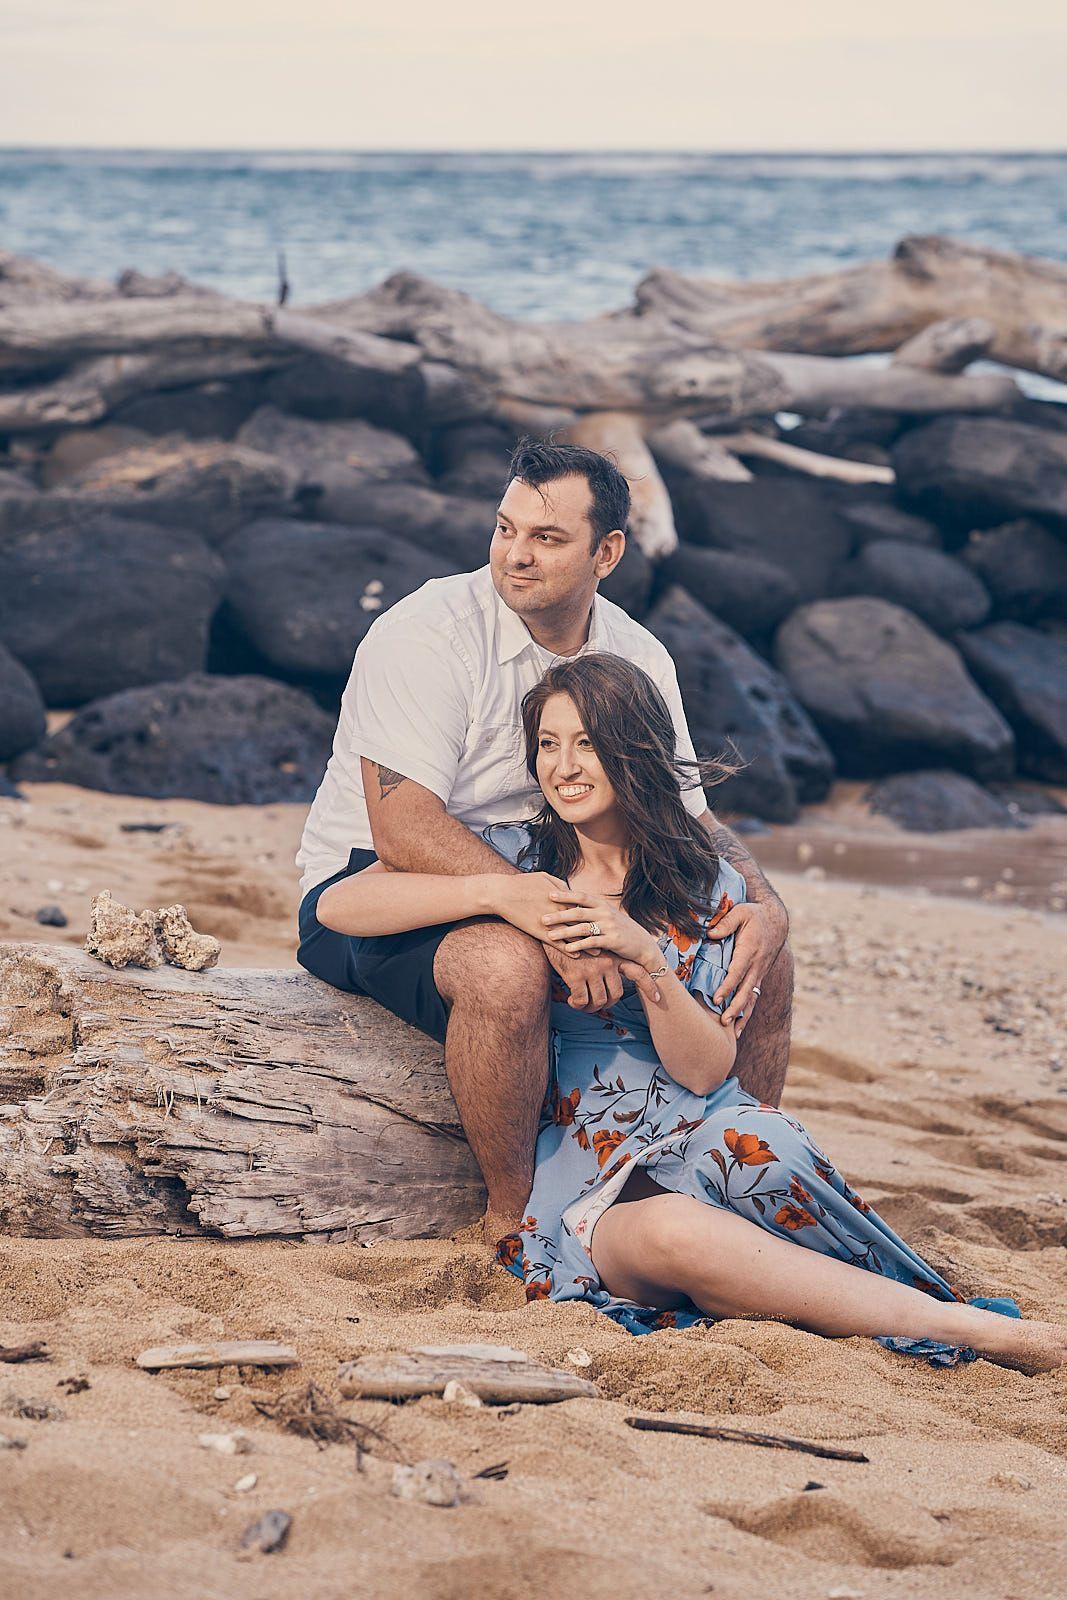 Photoshoot at Waipouli Beach by A Few Good Clicks